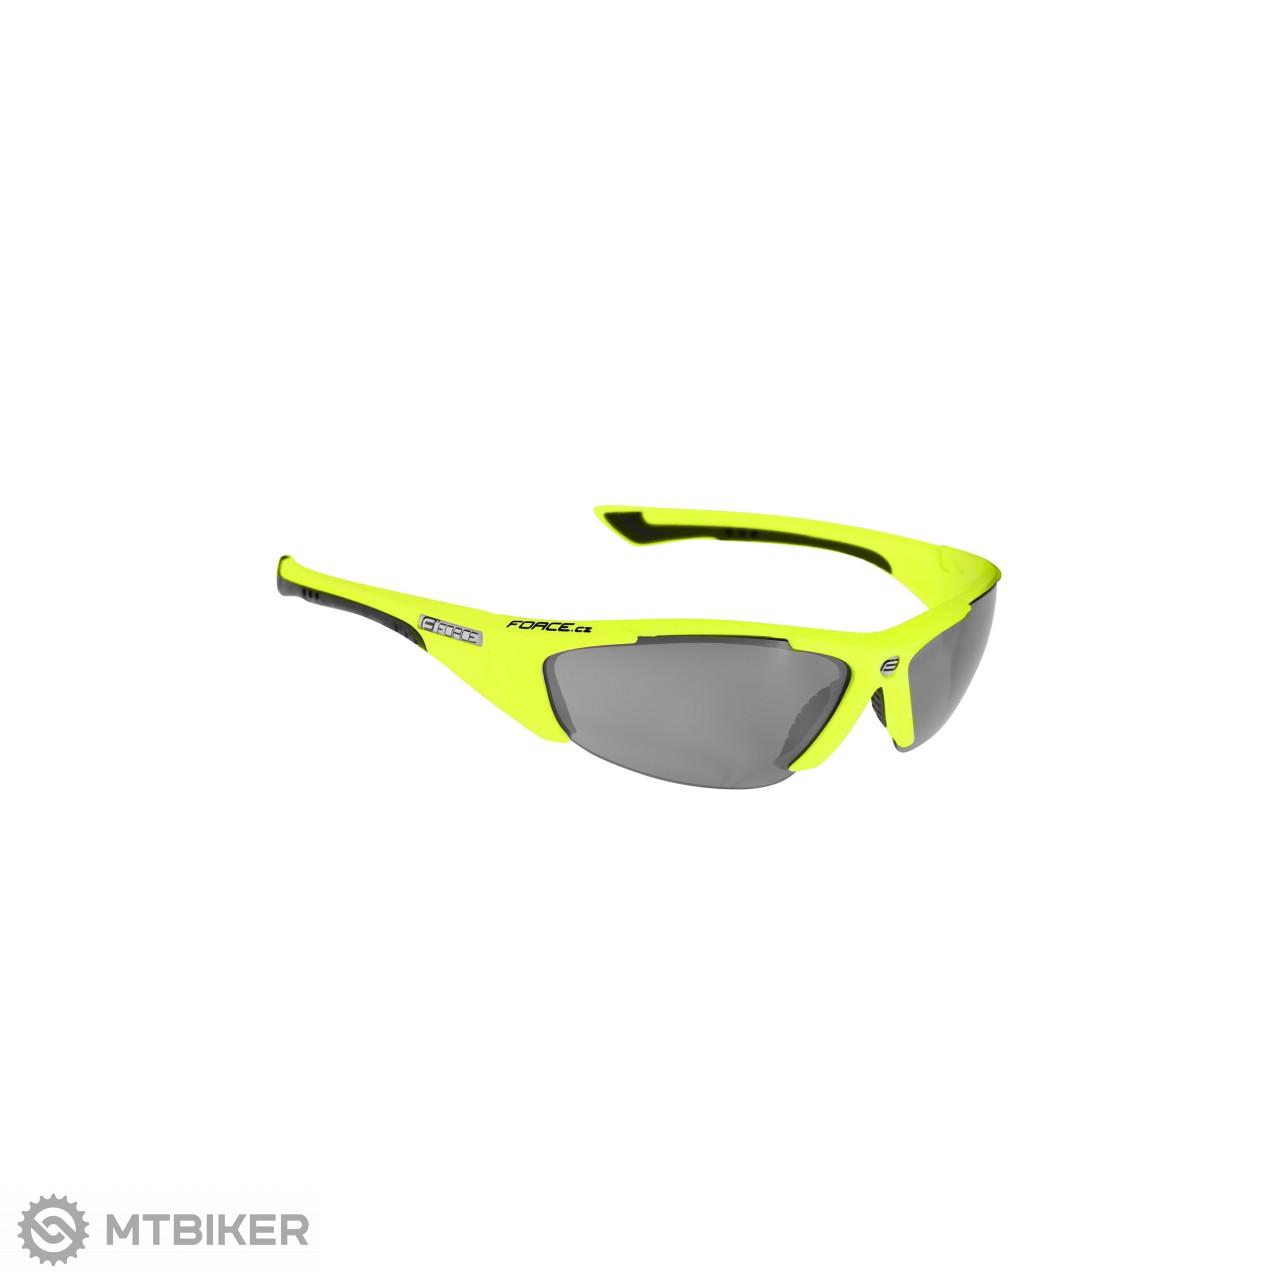 fadc14af3 Force Lady cyklistické okuliare fluo - MTBIKER Shop